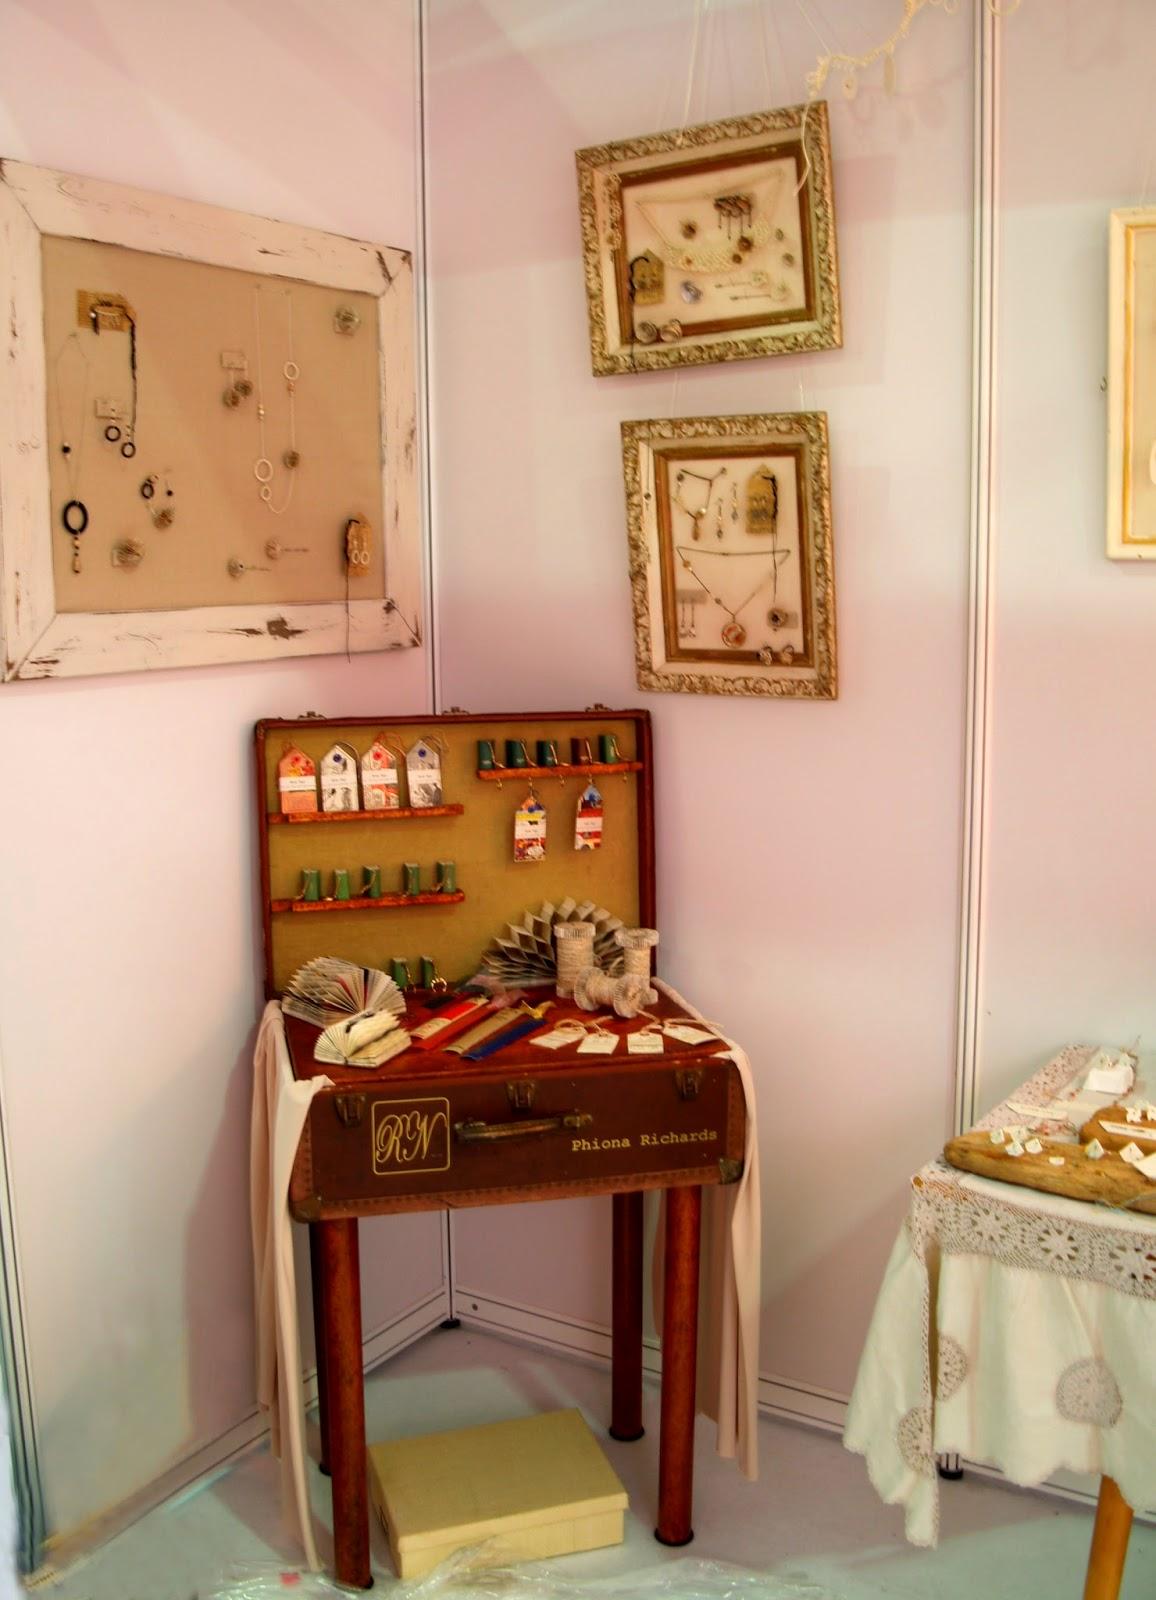 Rare Notions: BCTF, The British Craft Trade Fair 2014